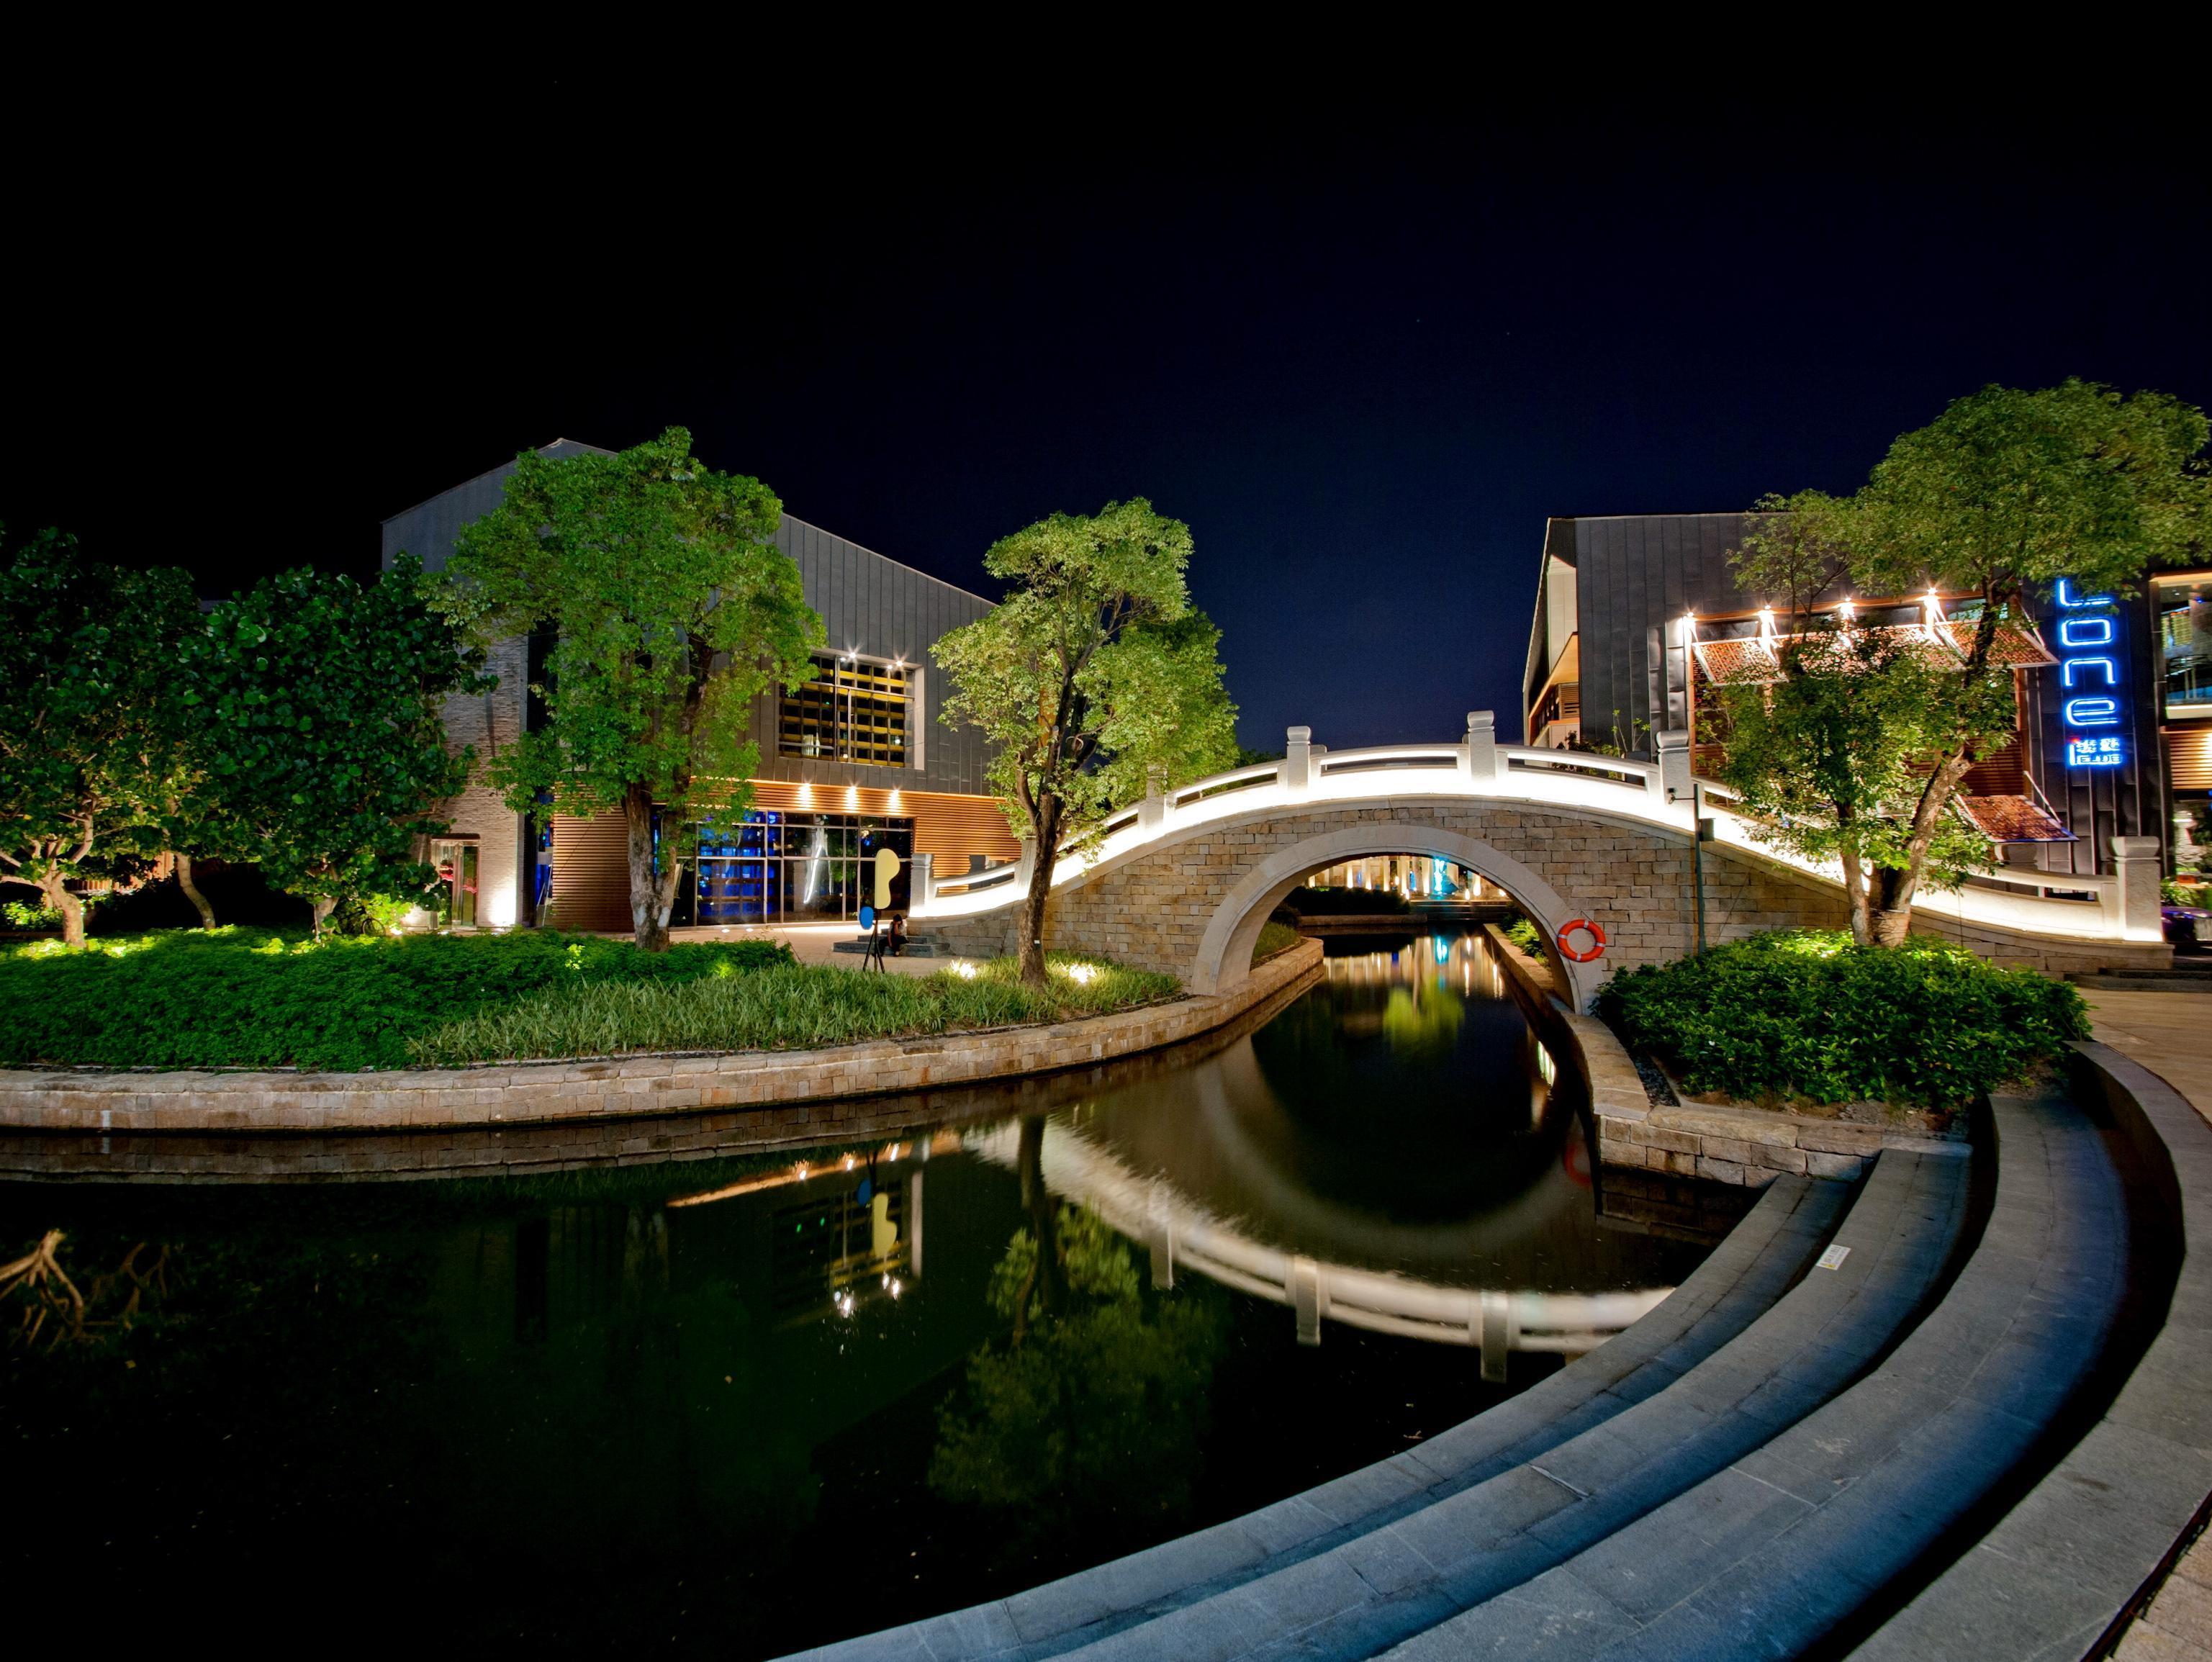 China, Shenzhen: OCT Harbour